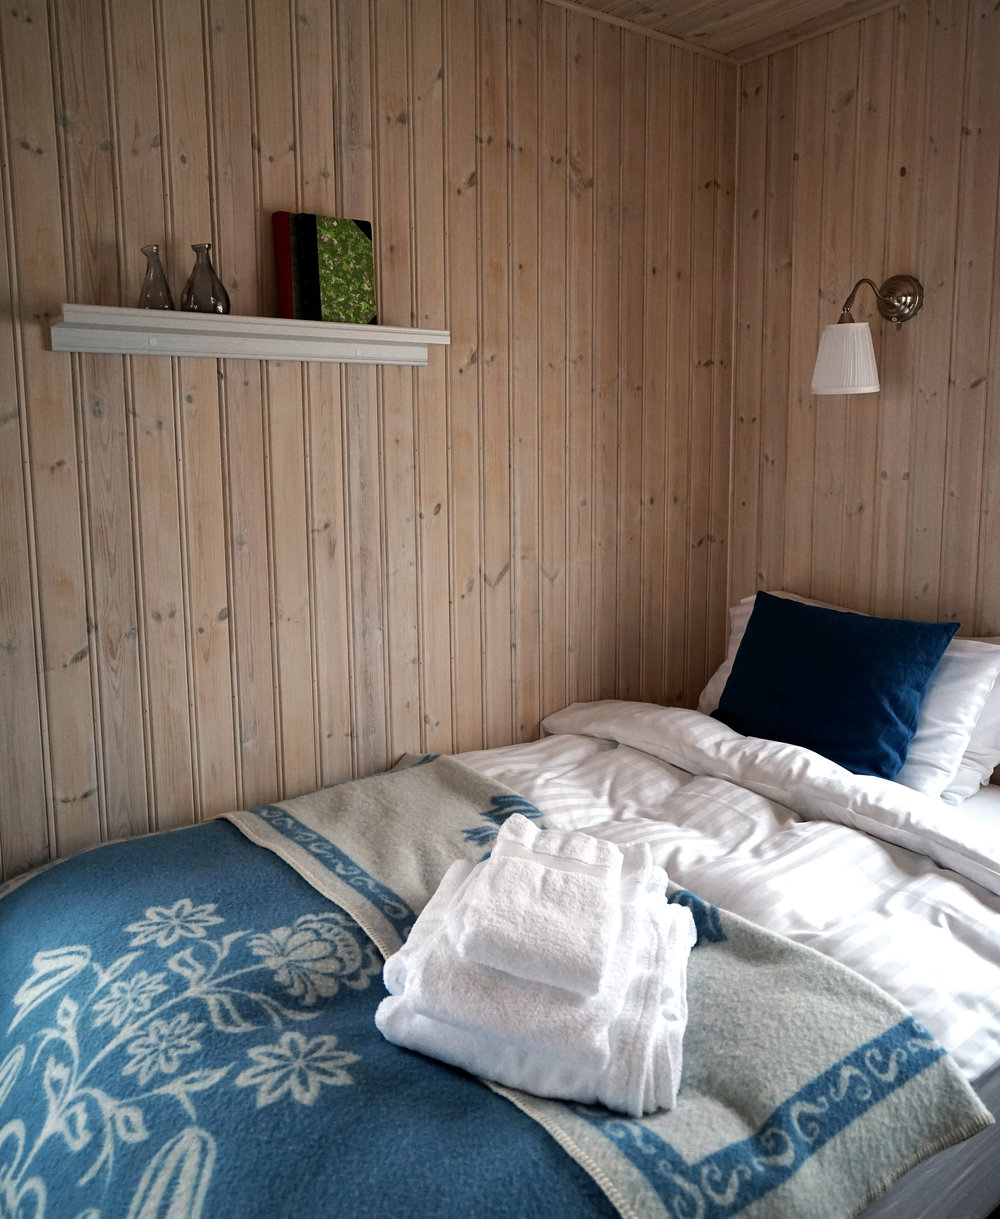 klængshóll-cabin-bed.jpg